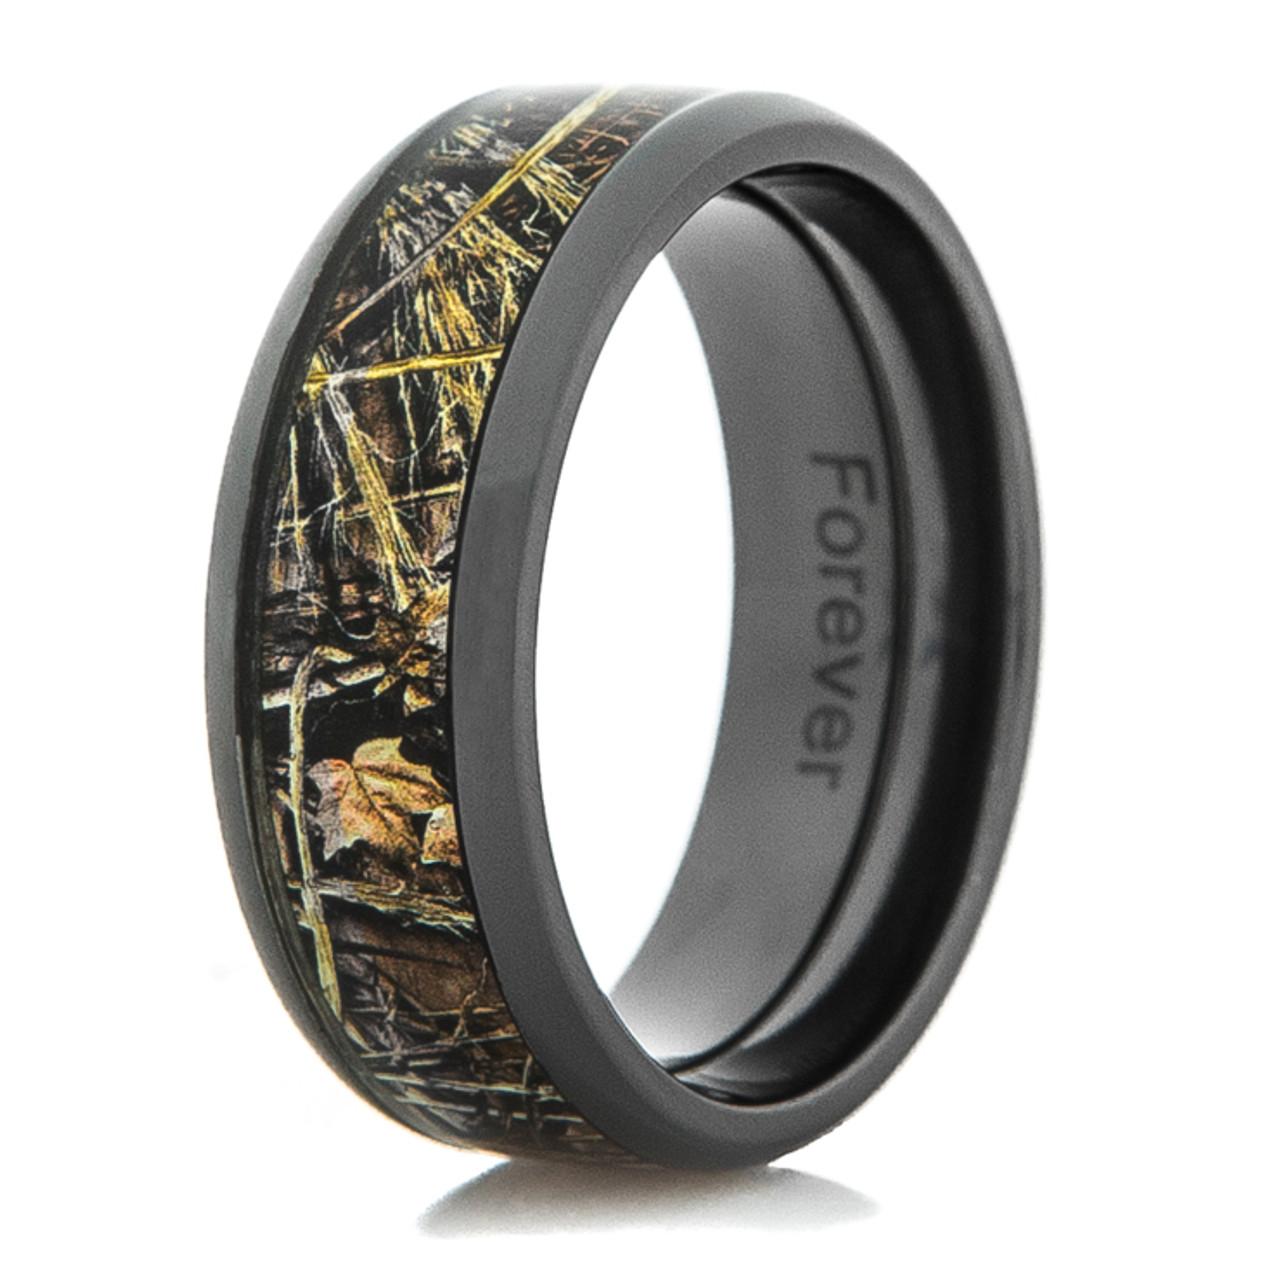 Realtree Camo Rings For Men